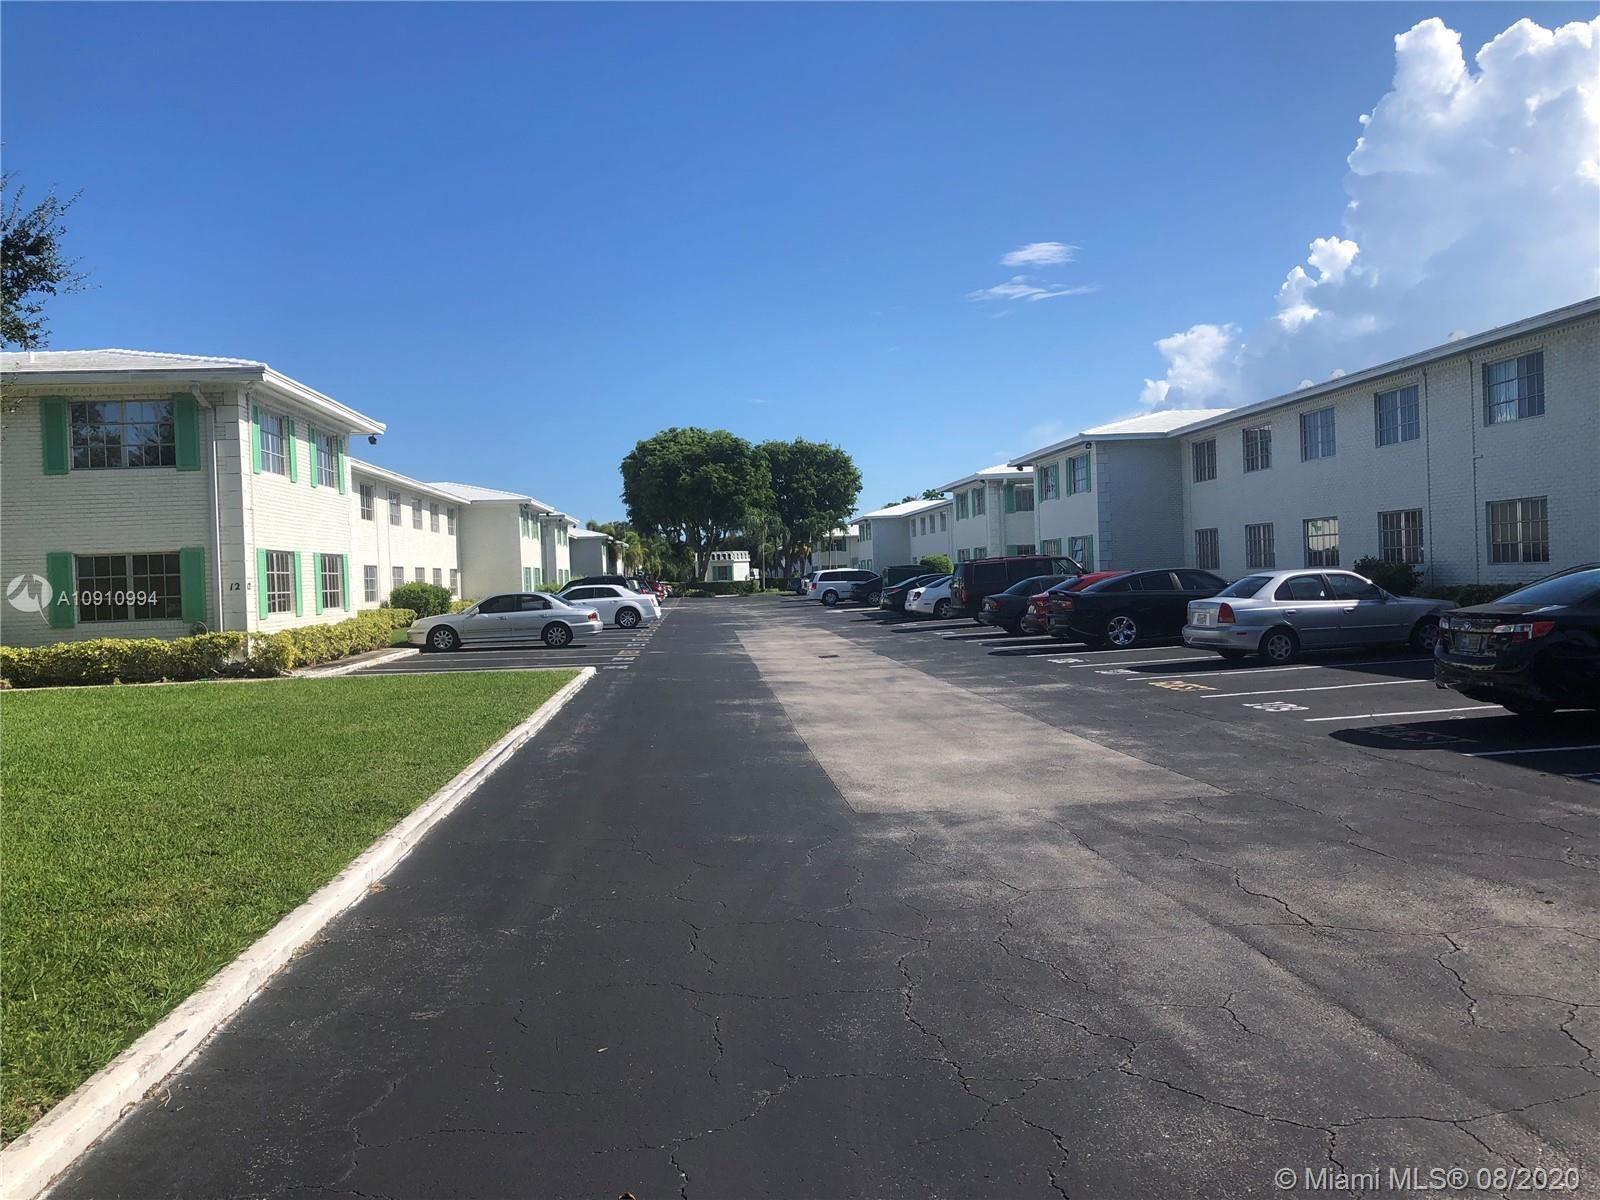 6263 NE 19th Ave #1006, Fort Lauderdale, FL 33308 - #: A10910994